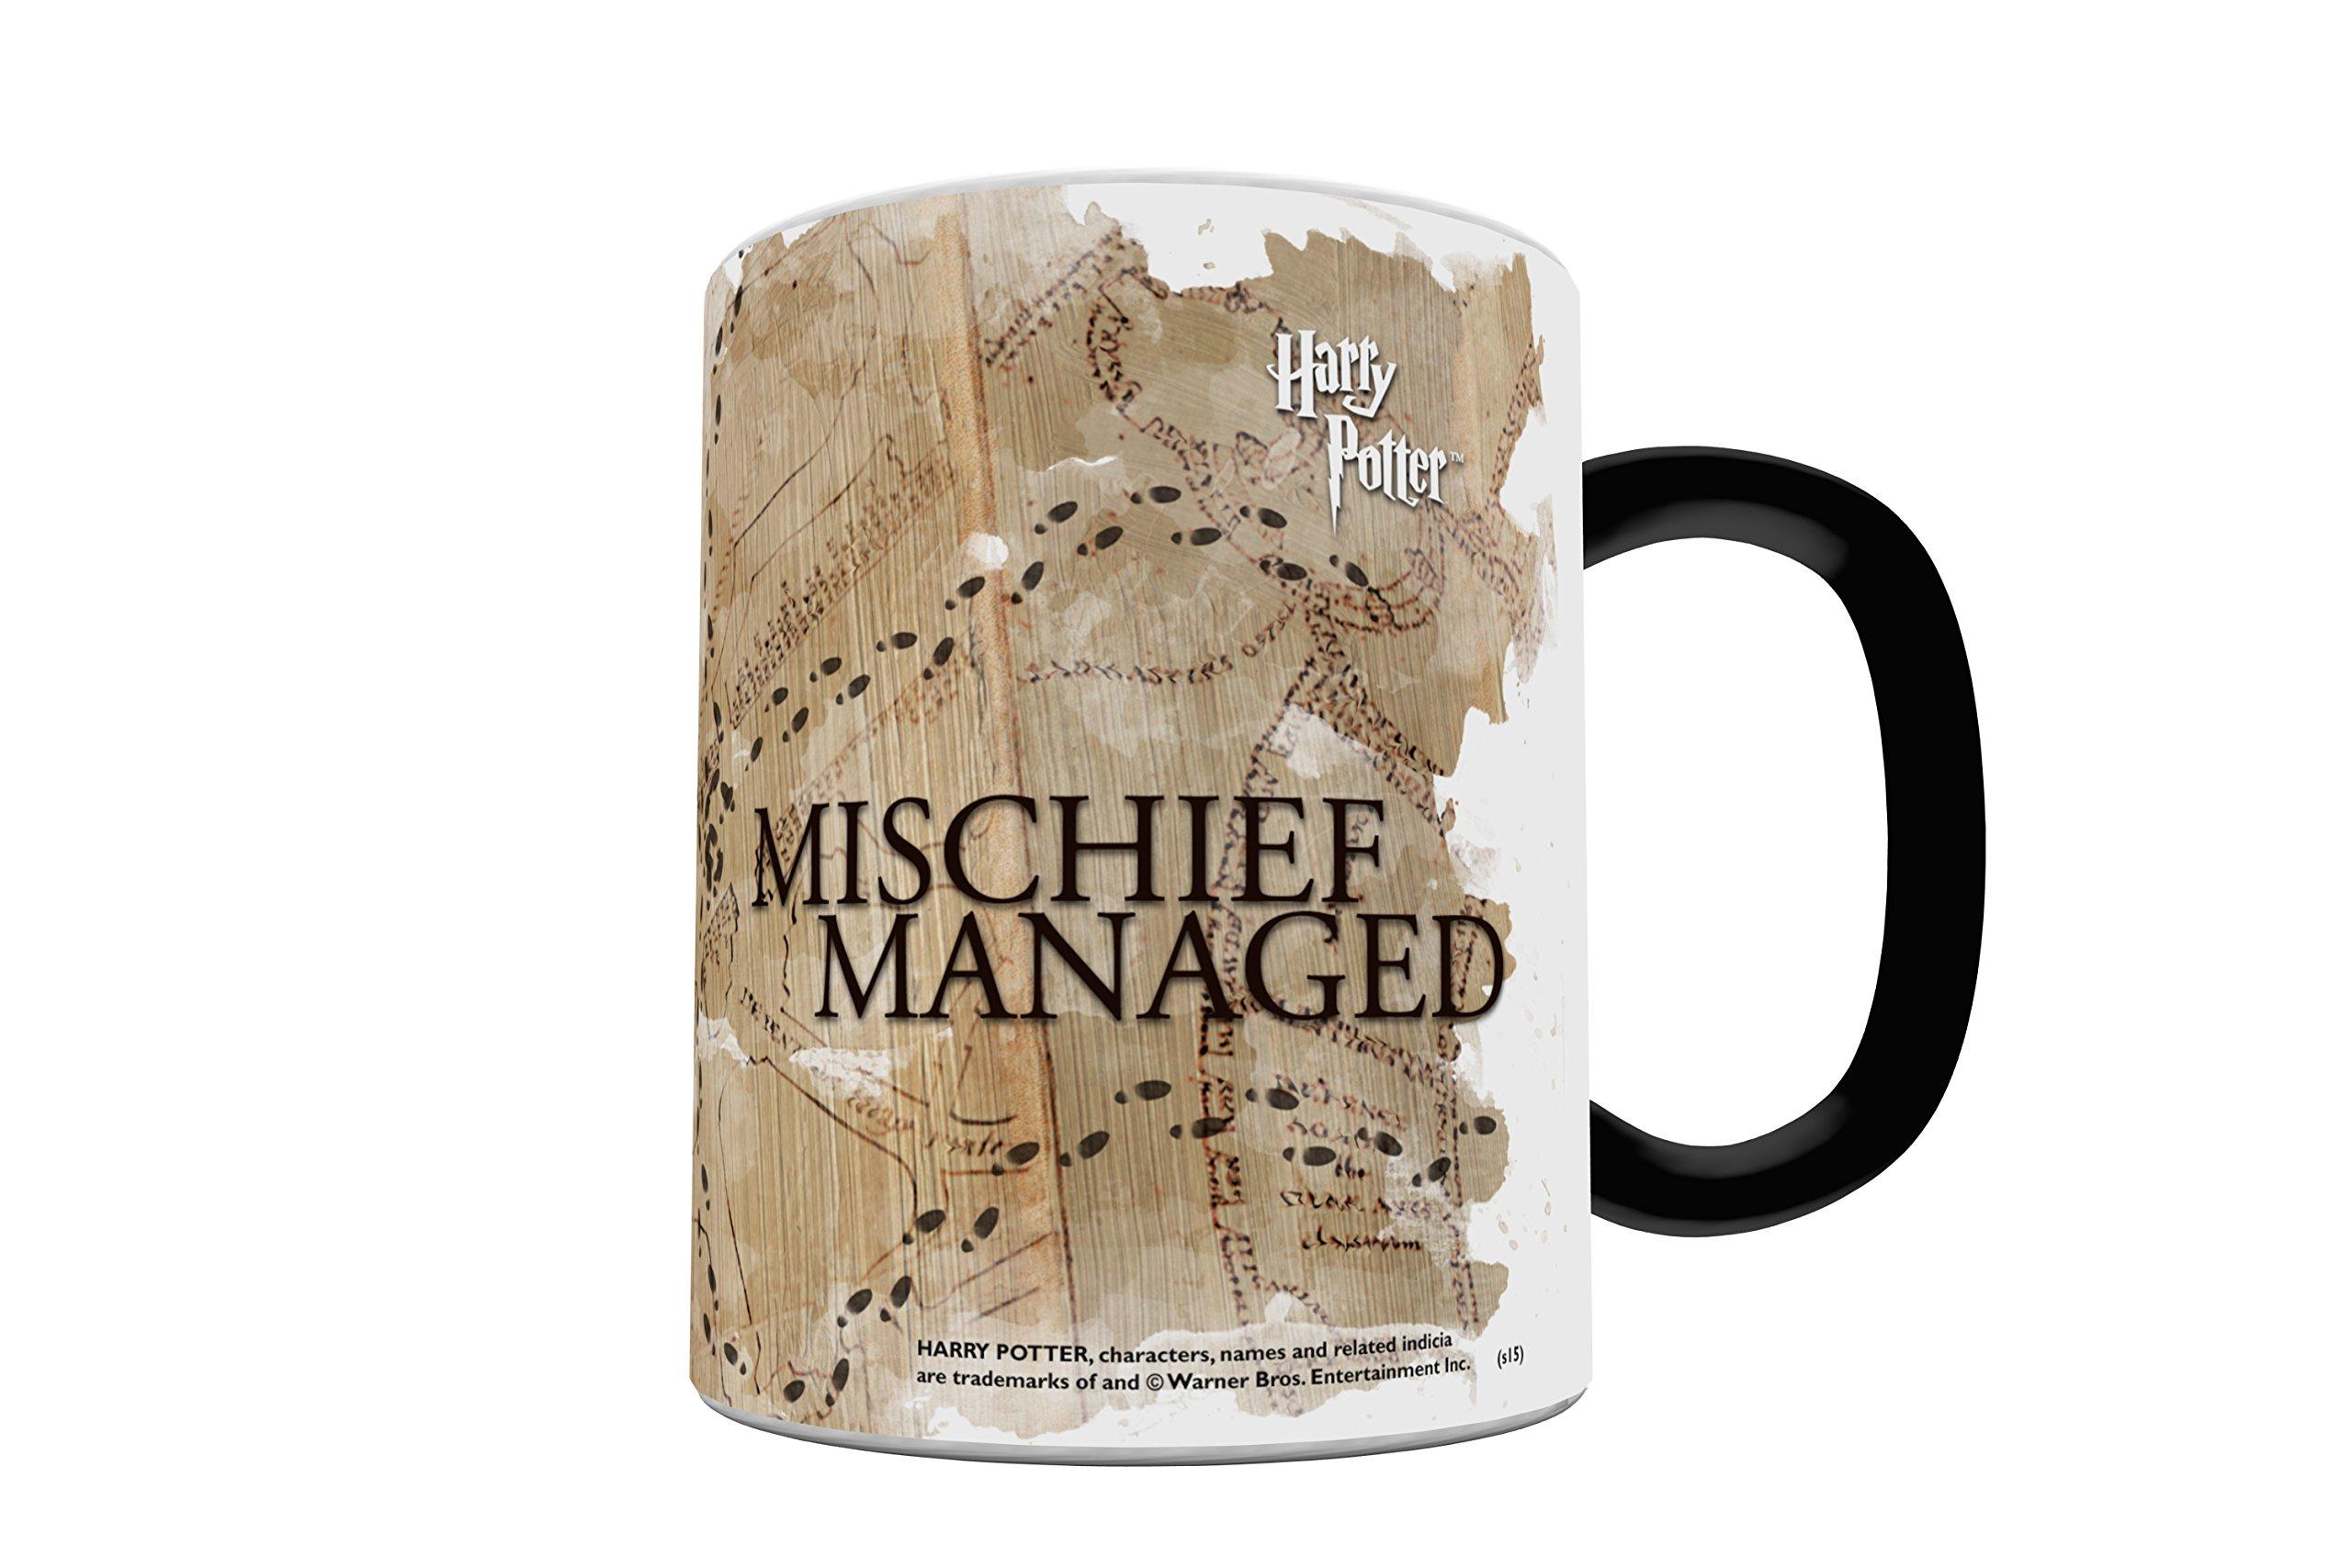 Morphing Mugs Harry Potter Hogwarts Marauders Map Heat Reveal Ceramic Coffee Mug - 11 Ounces by Morphing Mugs (Image #5)